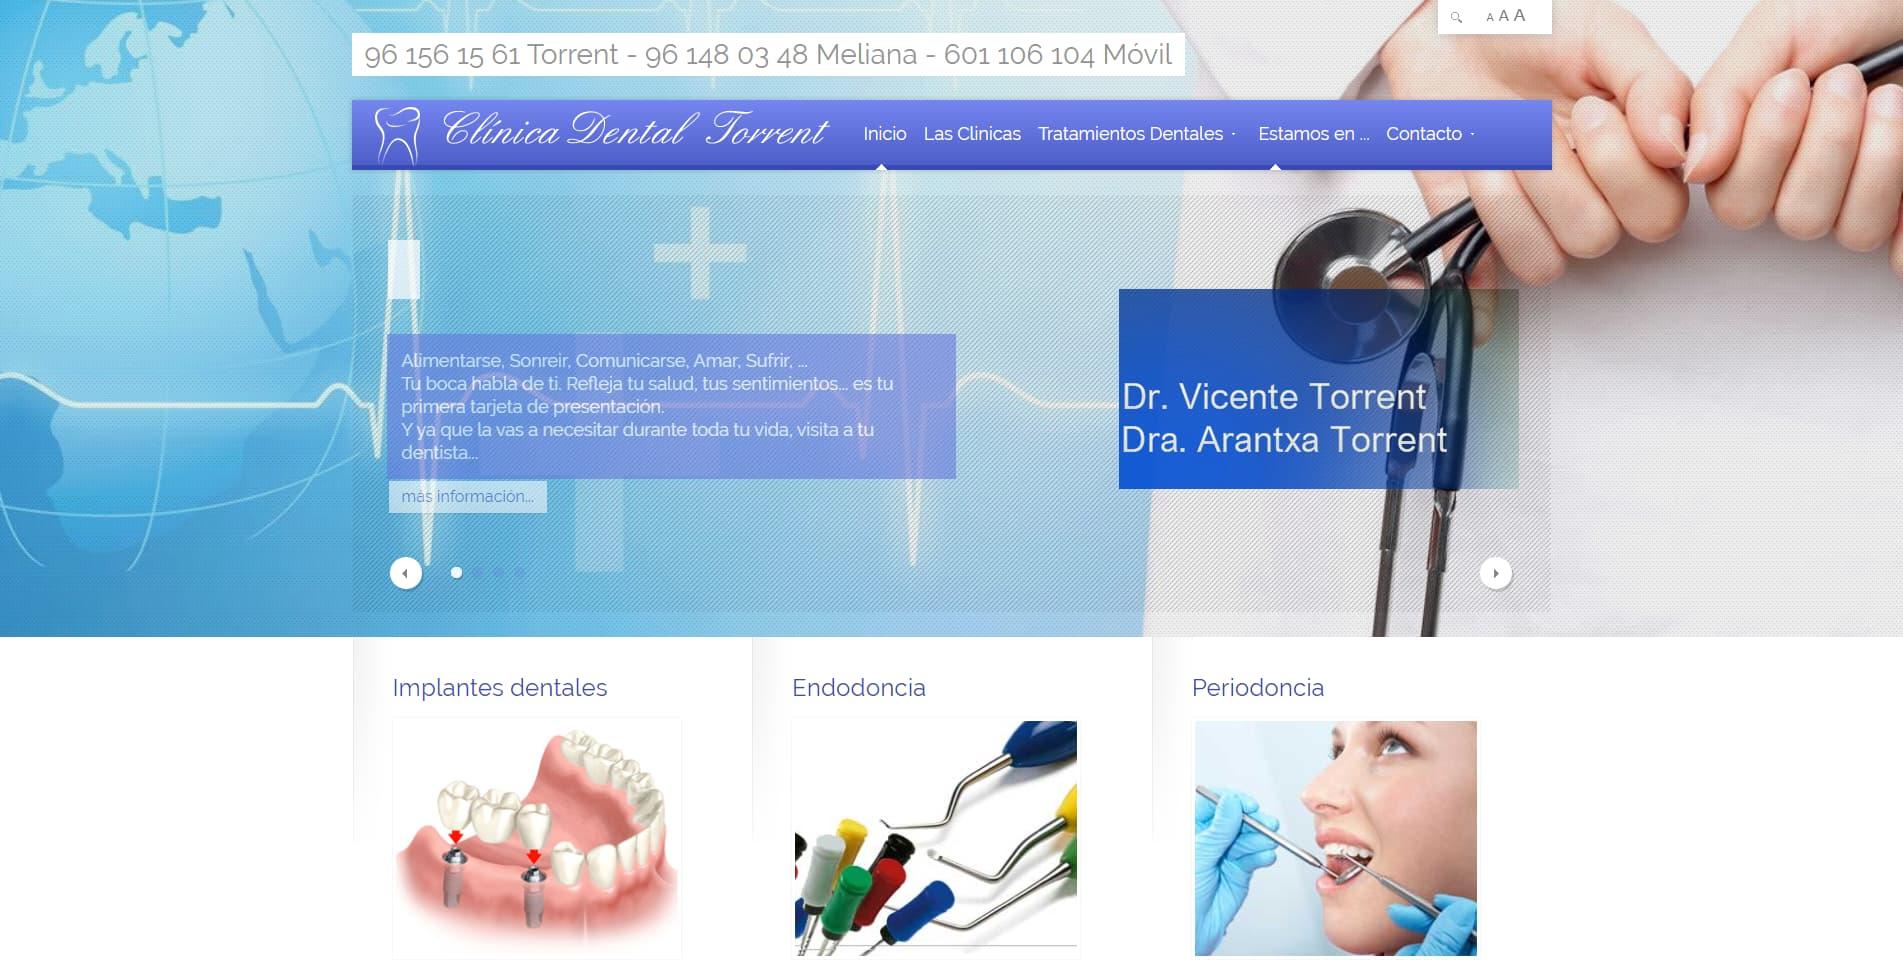 Clinicas Dentales V.Torrent